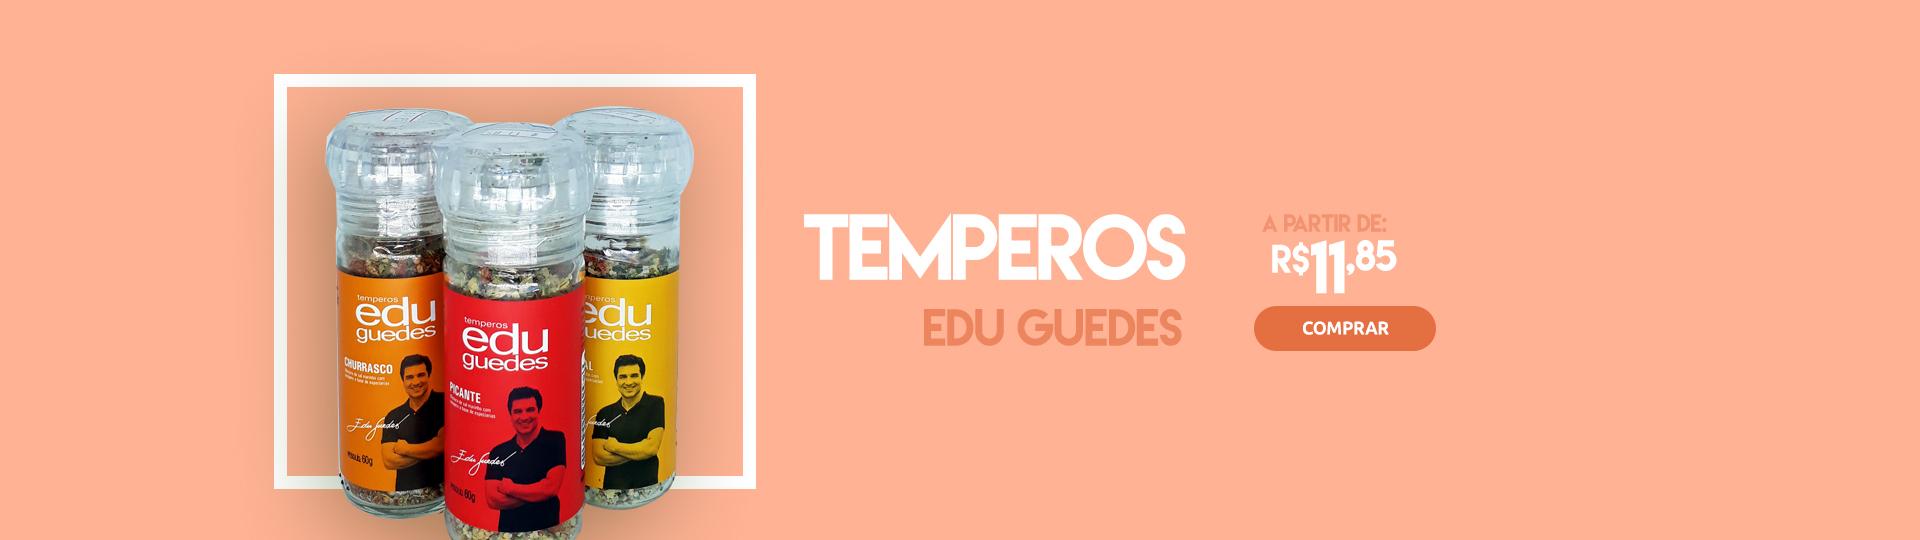 Temperos Edu Guedes